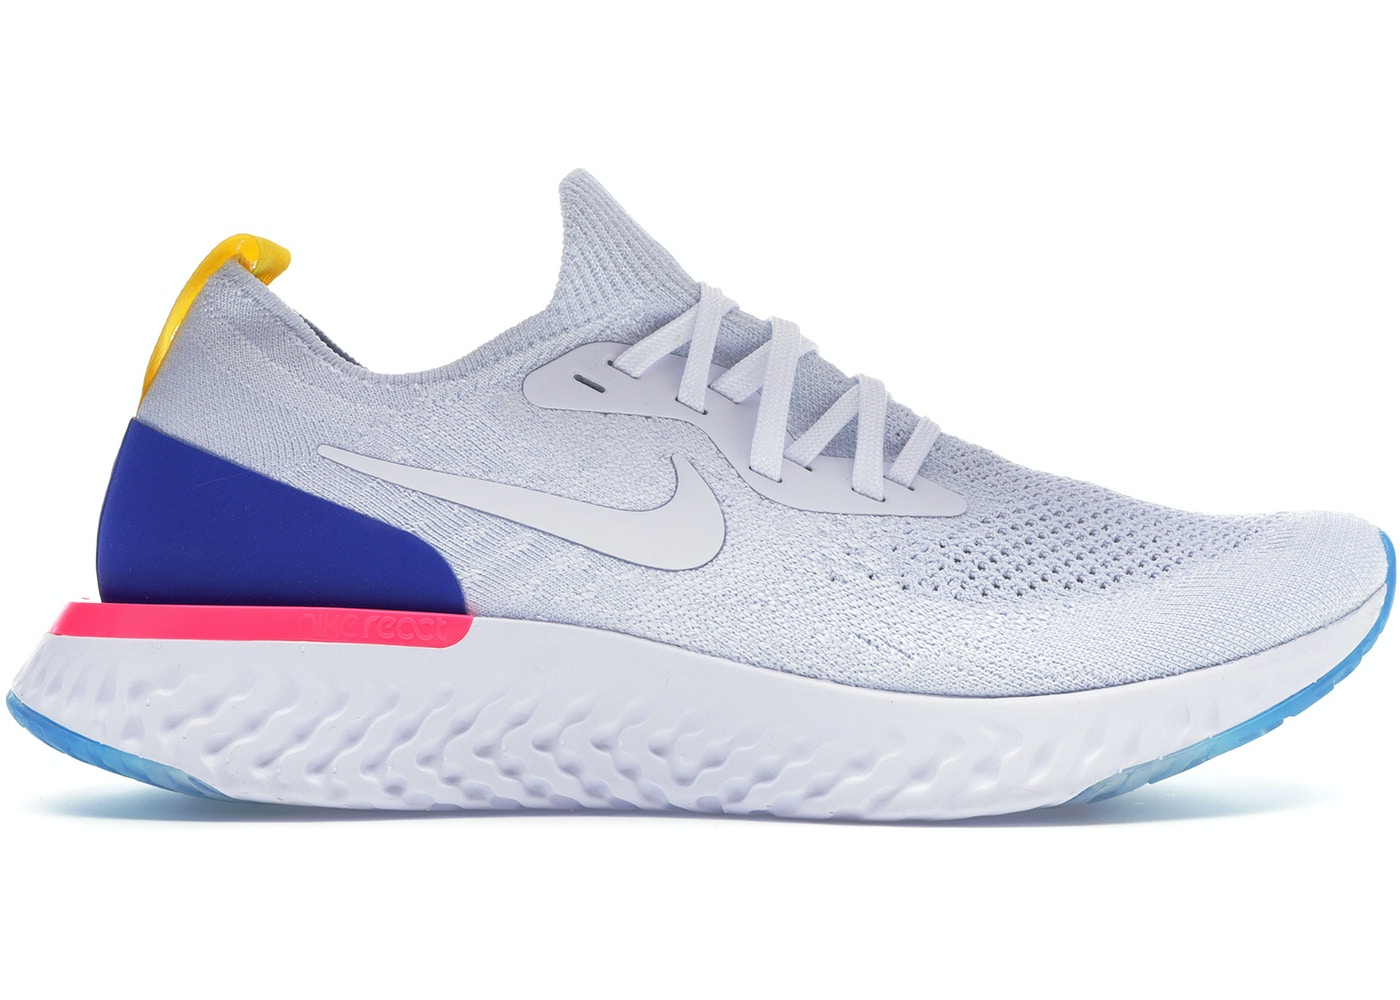 b7ee0730da1dd Nike Epic React Flyknit White Racer Blue Pink Blast